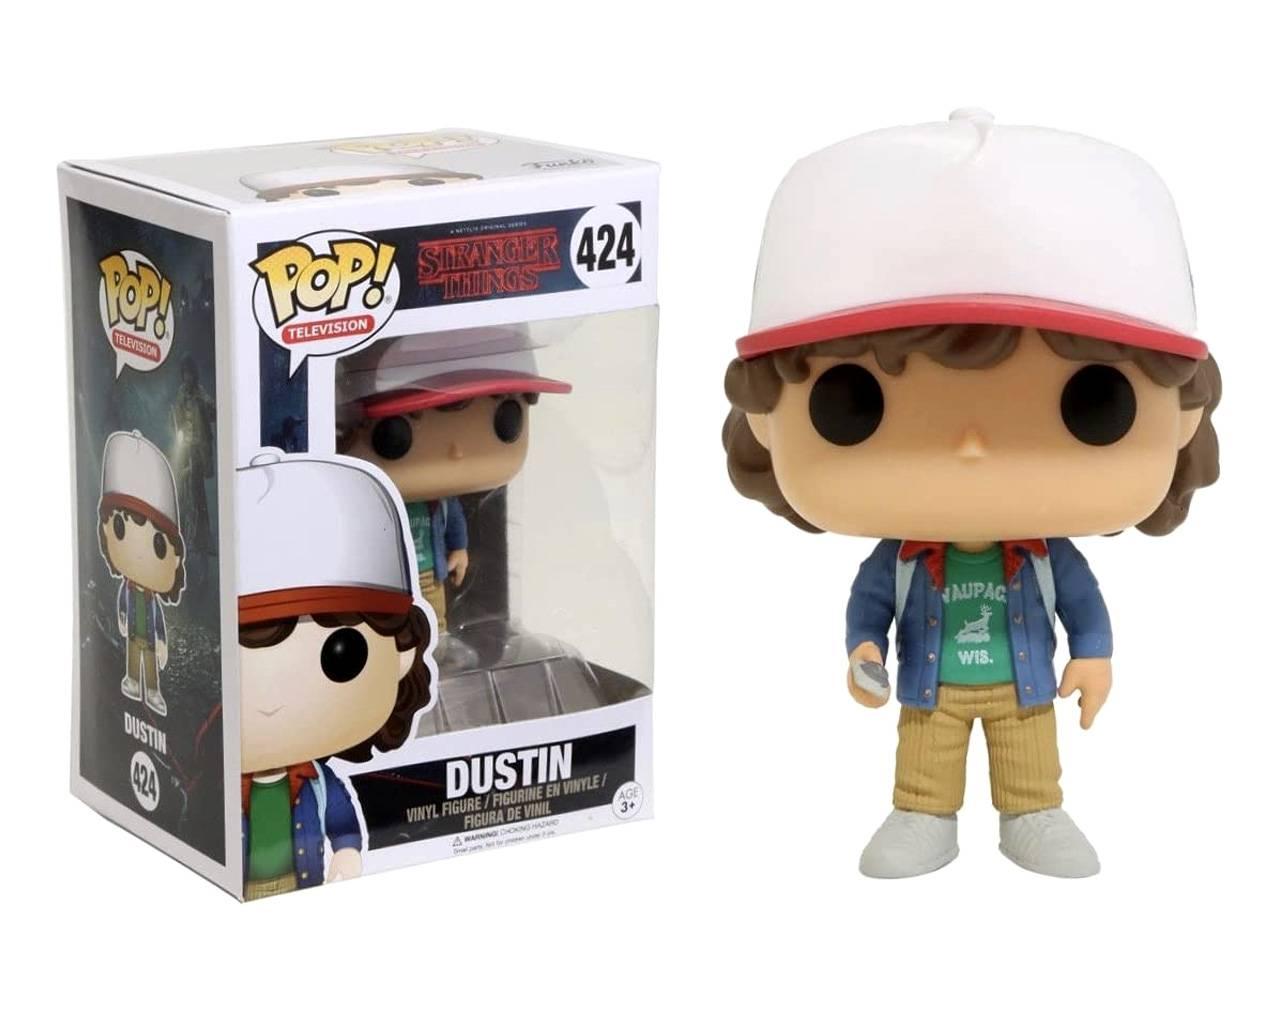 Dustin (Season 1) Pop! Vinyl